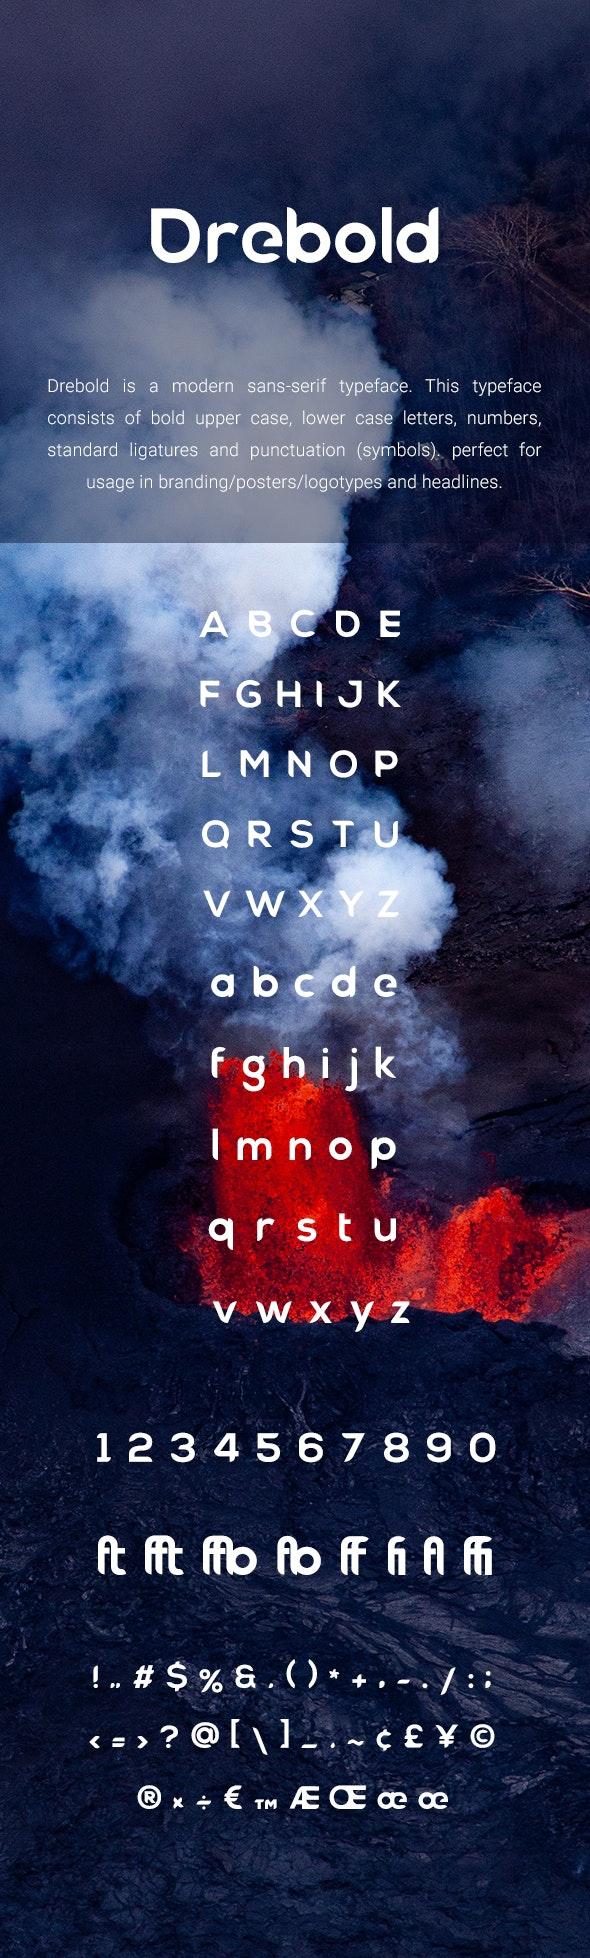 Drebold - Sans-Serif Fonts